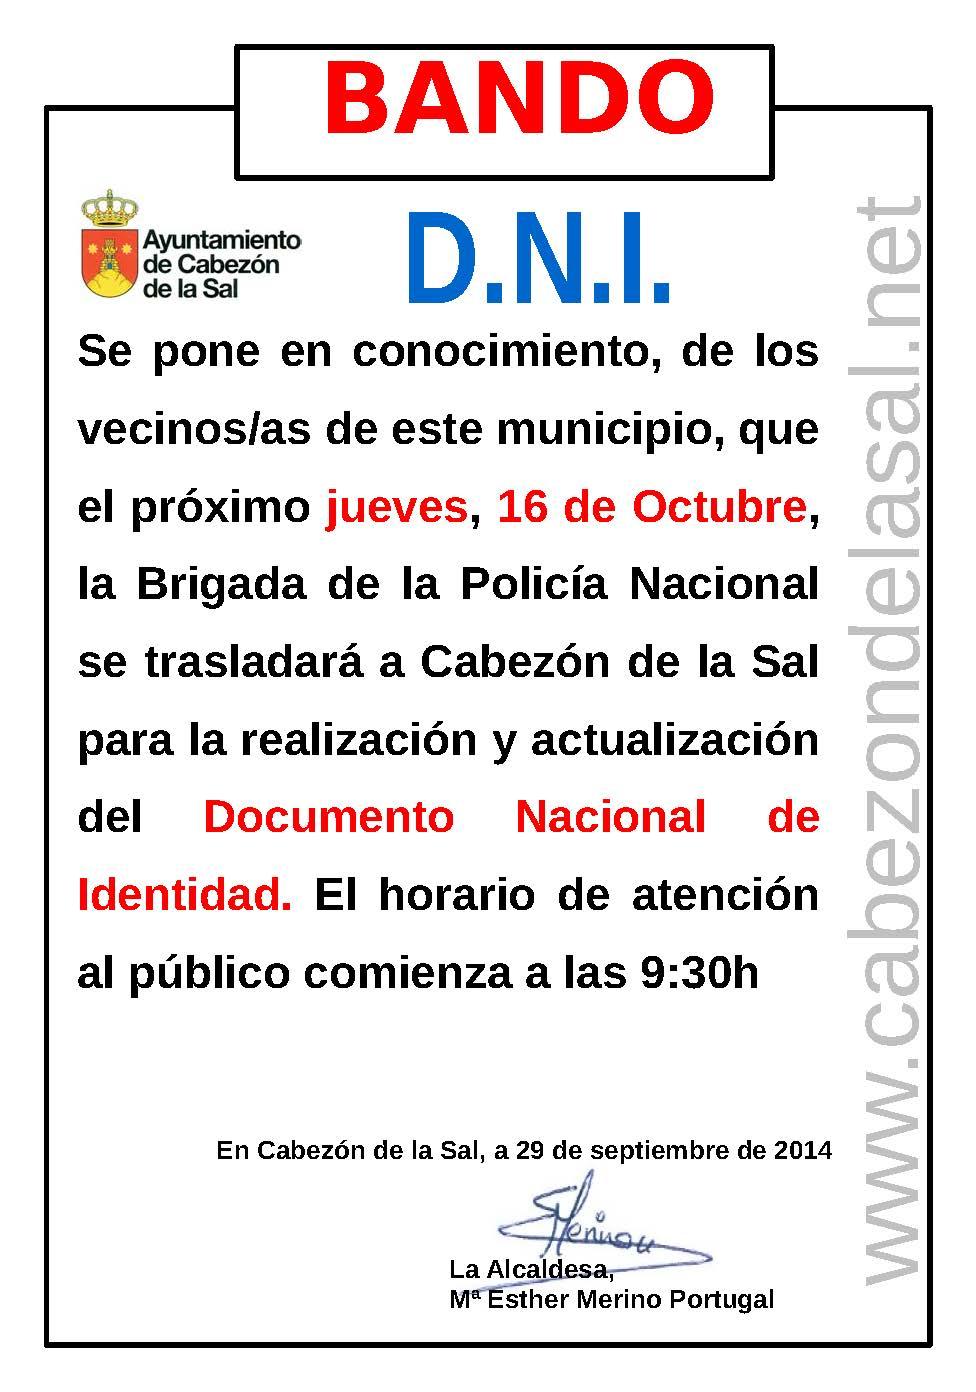 http://www.cabezondelasal.net/wp-content/uploads/2014/09/DNI_Octubre_2014.jpg